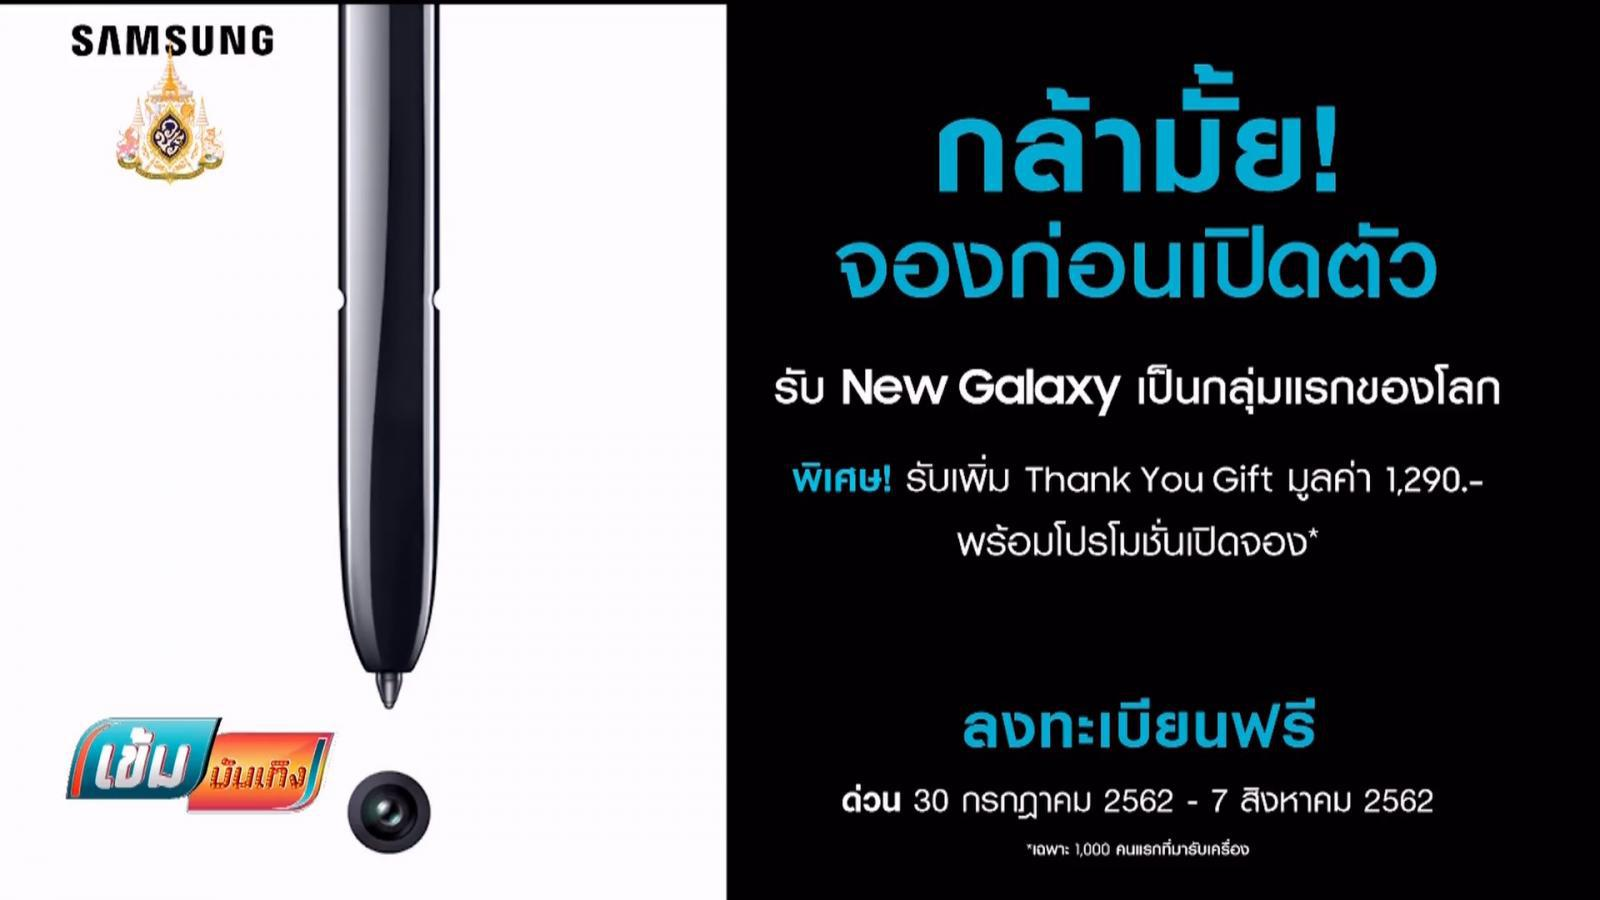 Samsung New Galaxy ที่ดีที่สุด